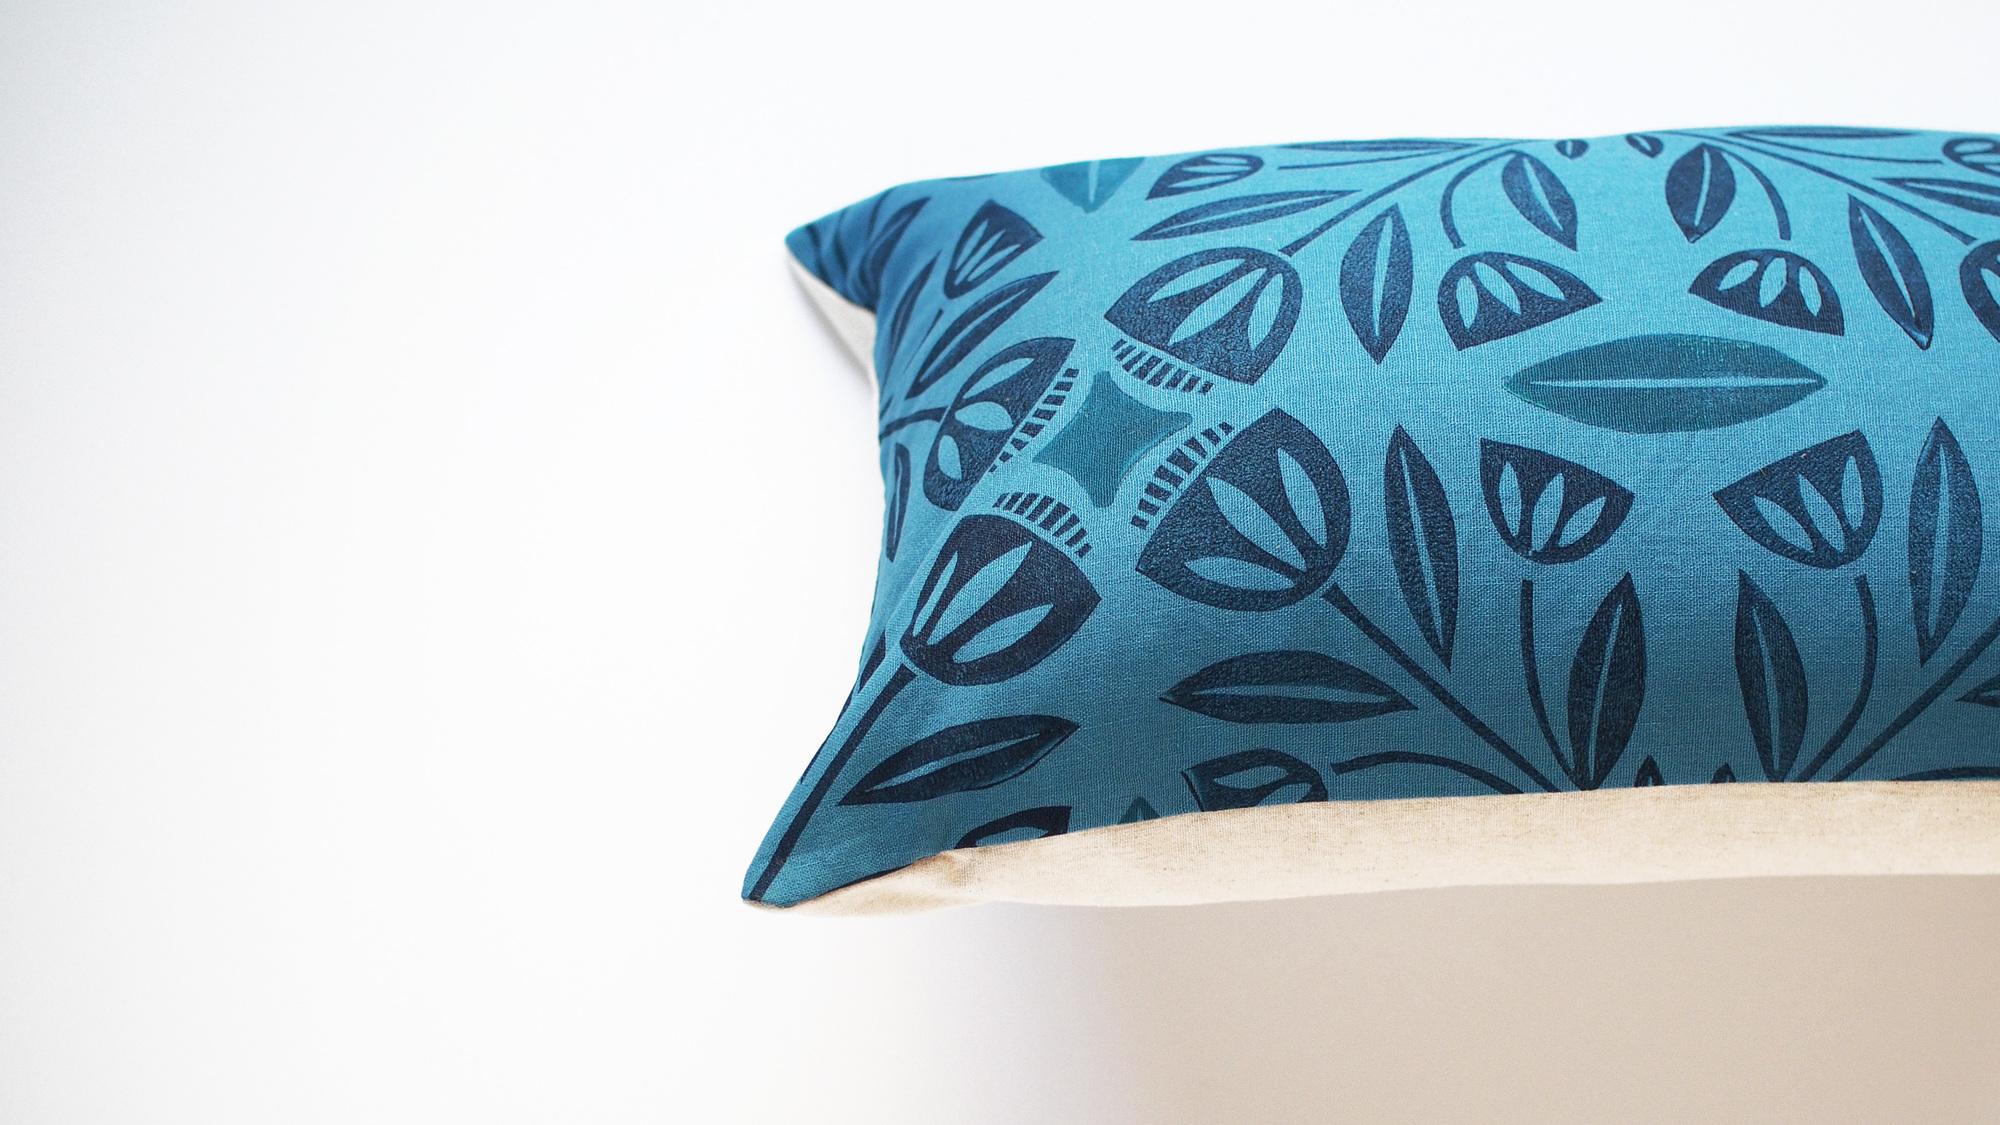 Handmade Block Printed Pillow -  Scandinavian Dream in Teal